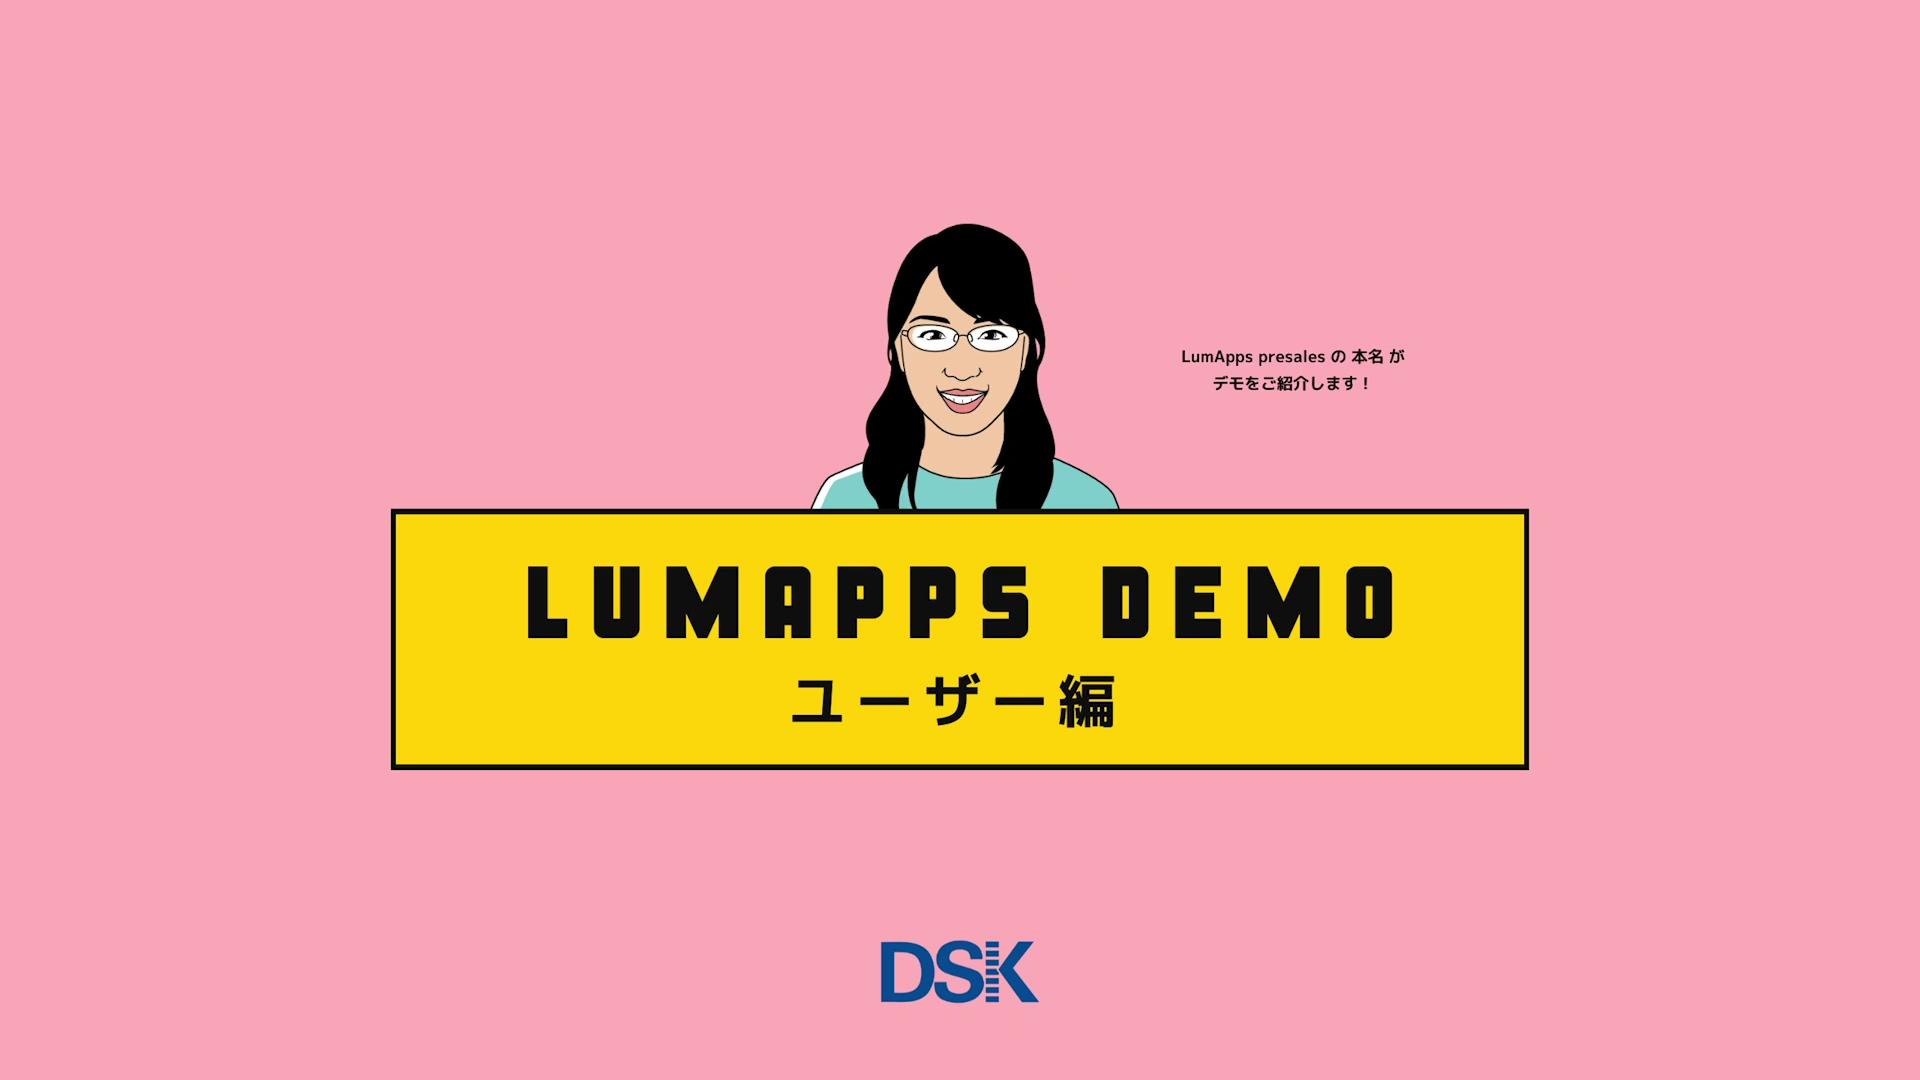 lumapps-demo-user-edition